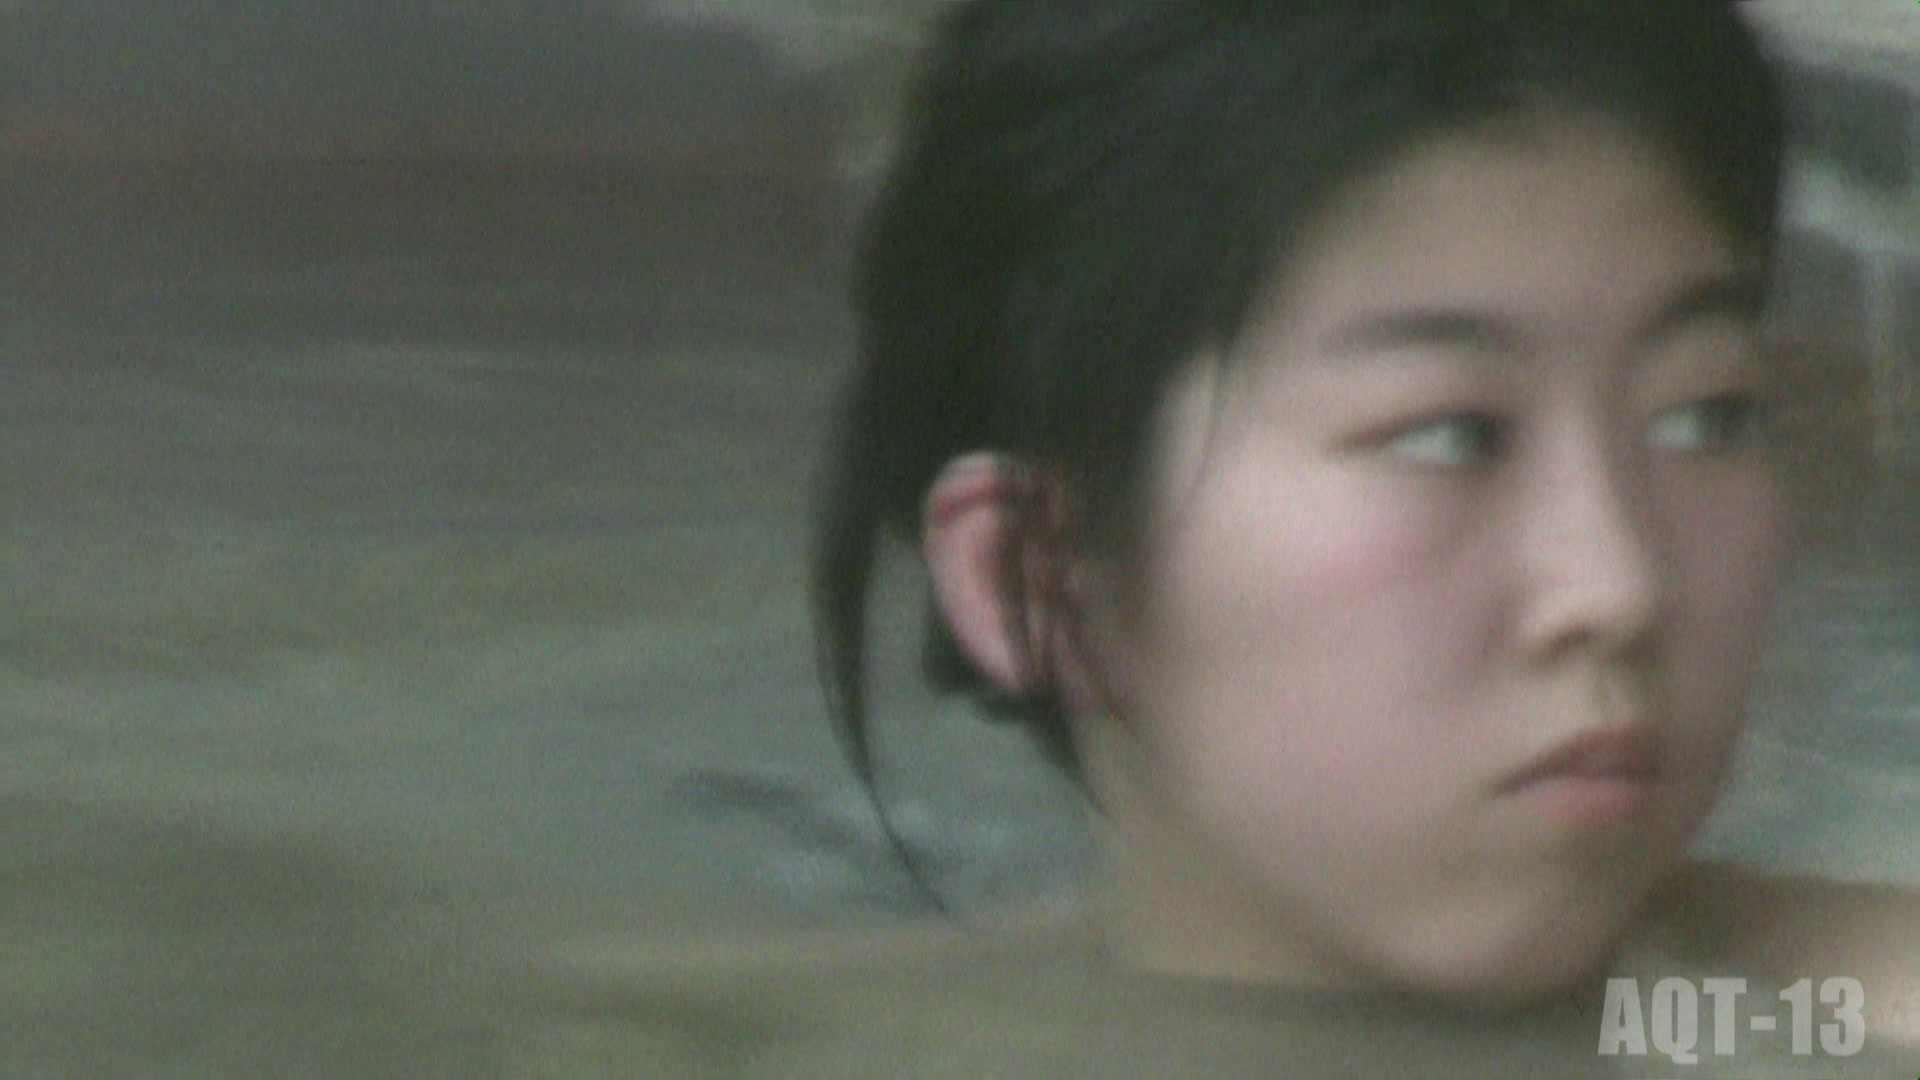 Aquaな露天風呂Vol.816 露天 AV動画キャプチャ 105PICs 20